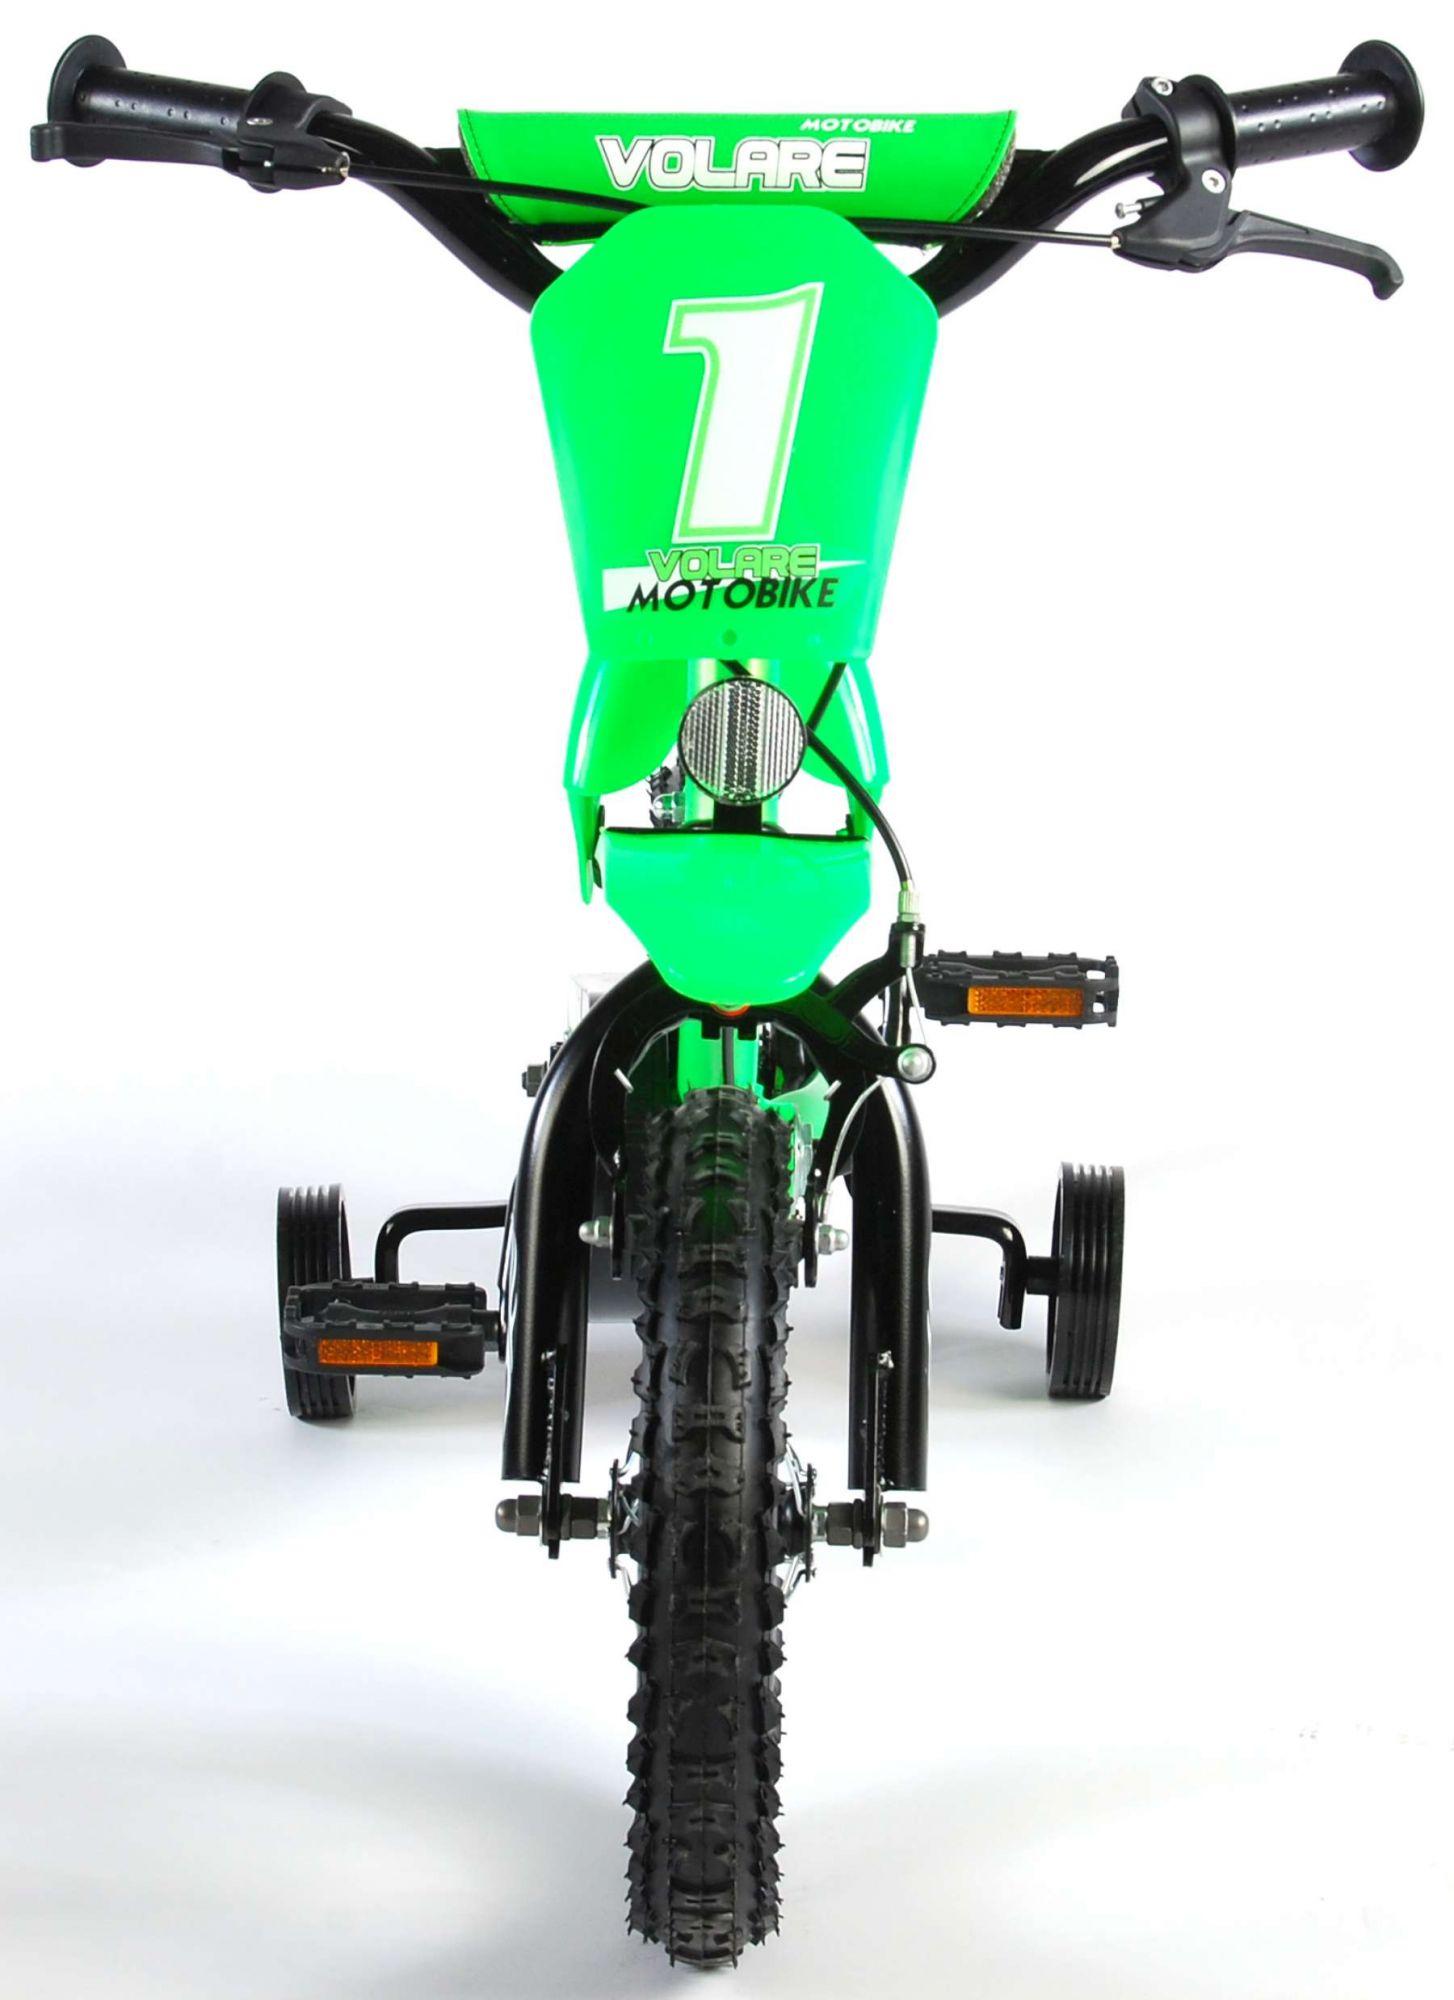 Bicicleta Motorbike de 12 pulgadas Verde - vista frontal